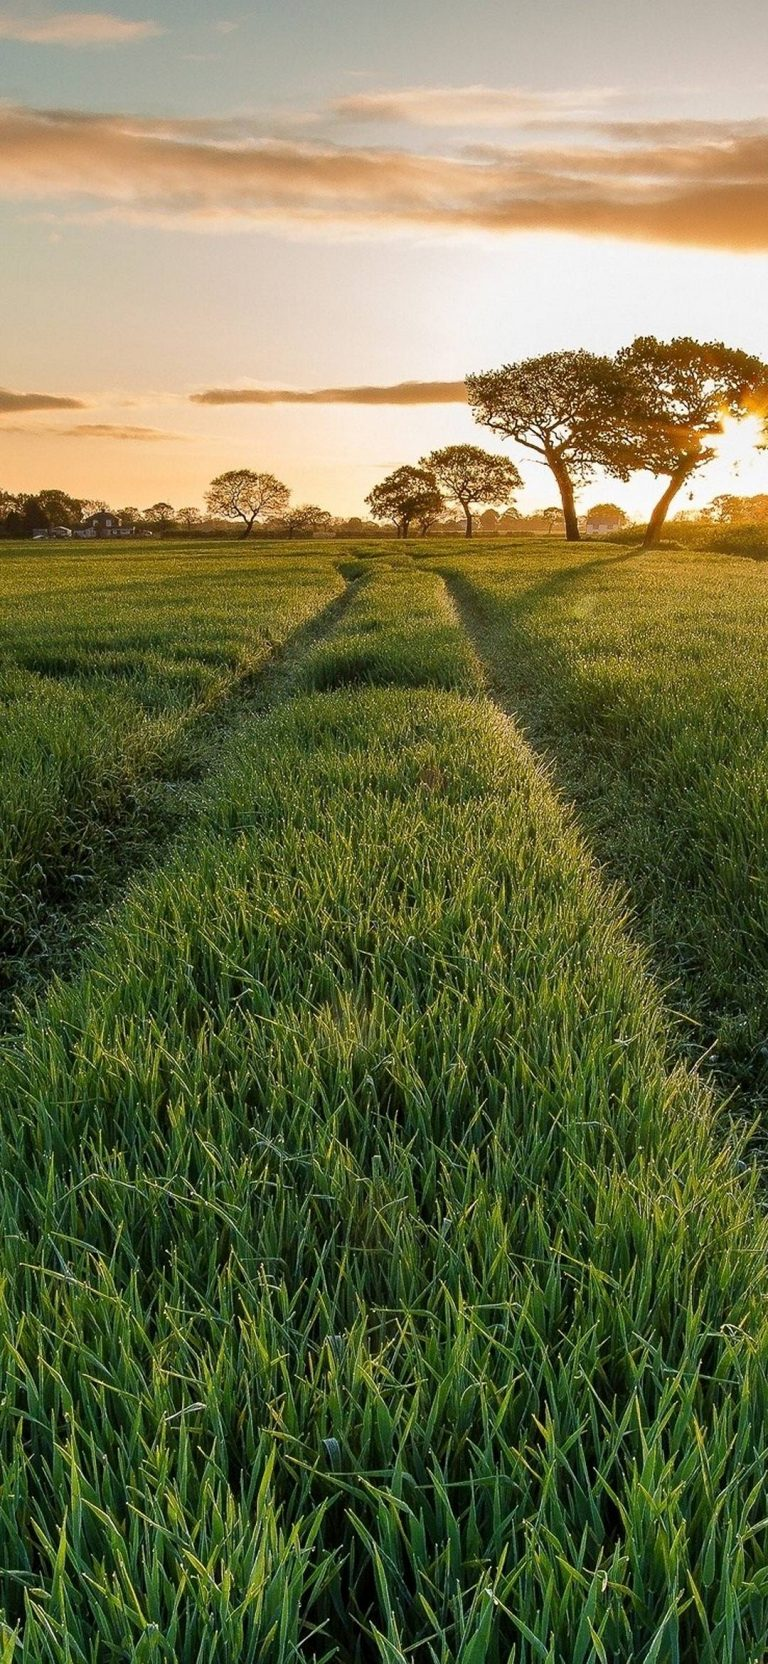 Field Grass Sun Sky 1080x2340 768x1664